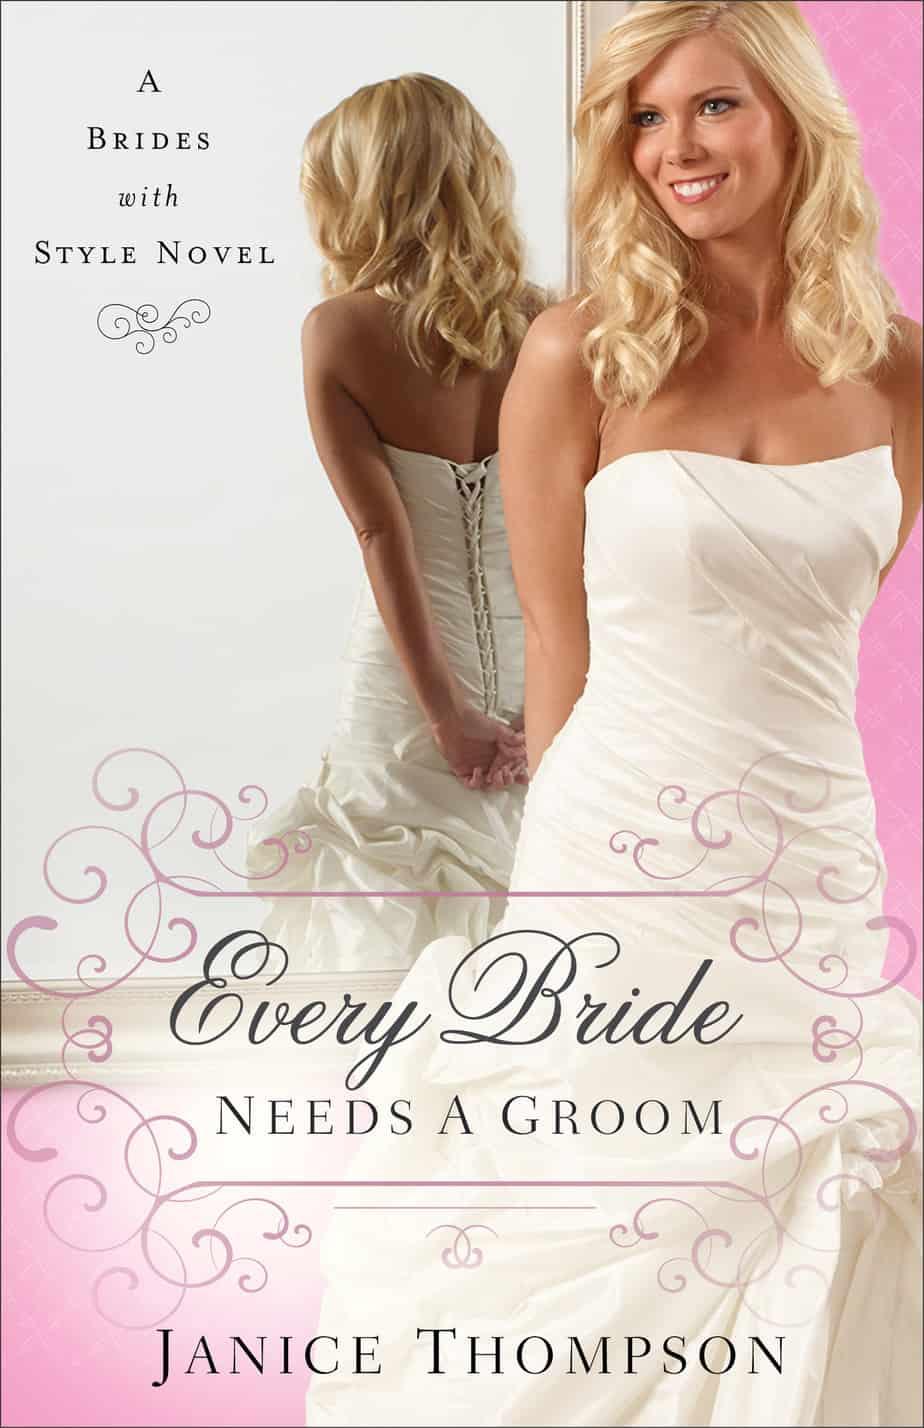 Every Bride Needs a Groom by Janice Thompson